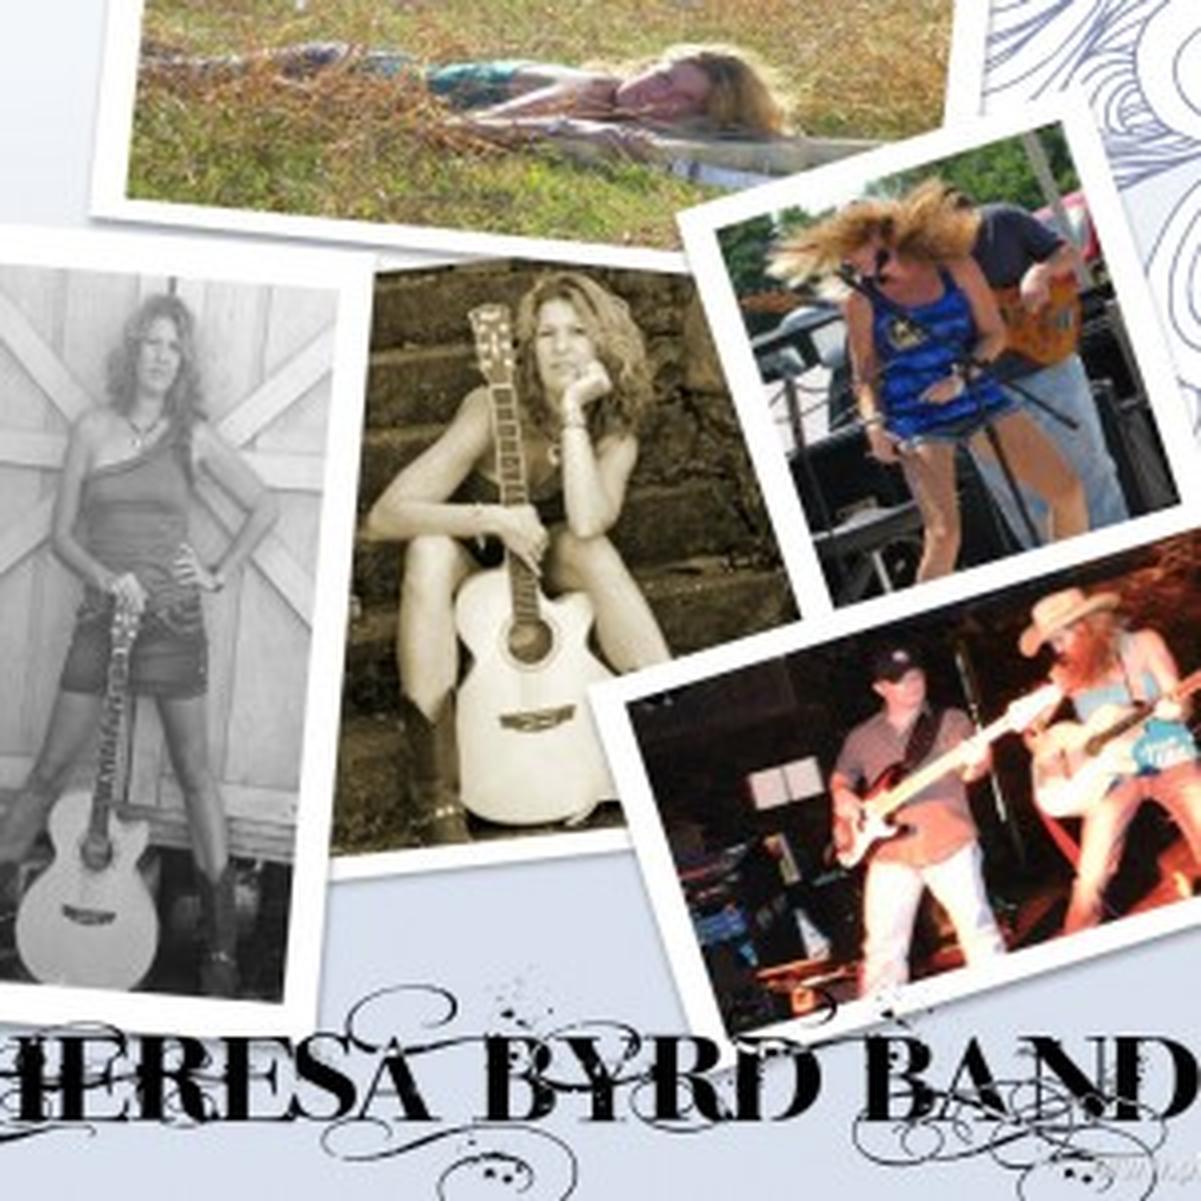 Theresa Byrd Band wiki, Theresa Byrd Band review, Theresa Byrd Band history, Theresa Byrd Band news